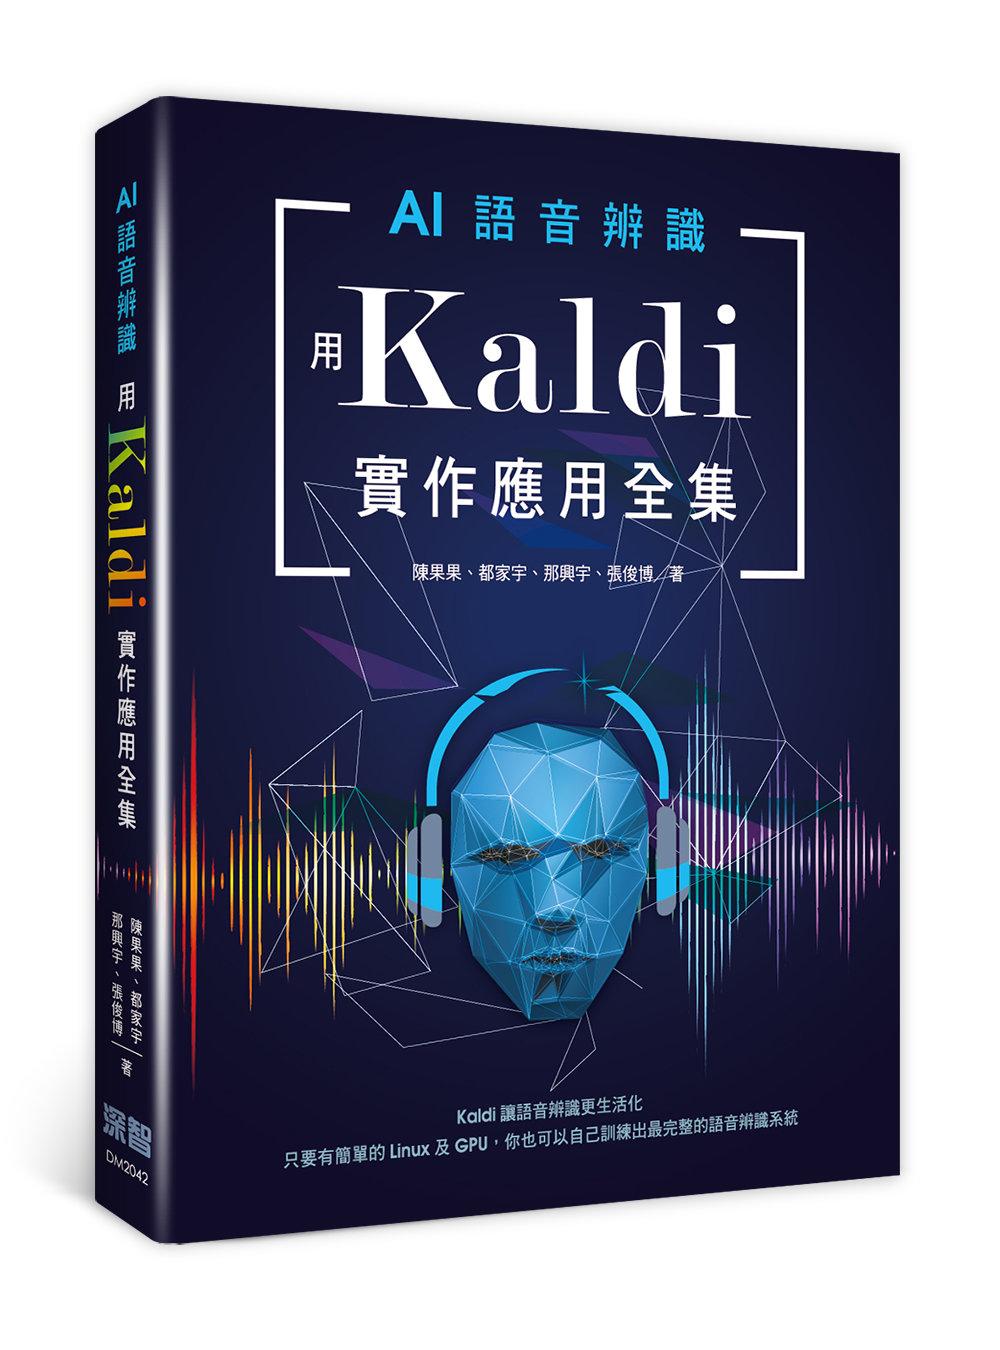 AI 語音辨識:用 Kaldi 實作應用全集-preview-1